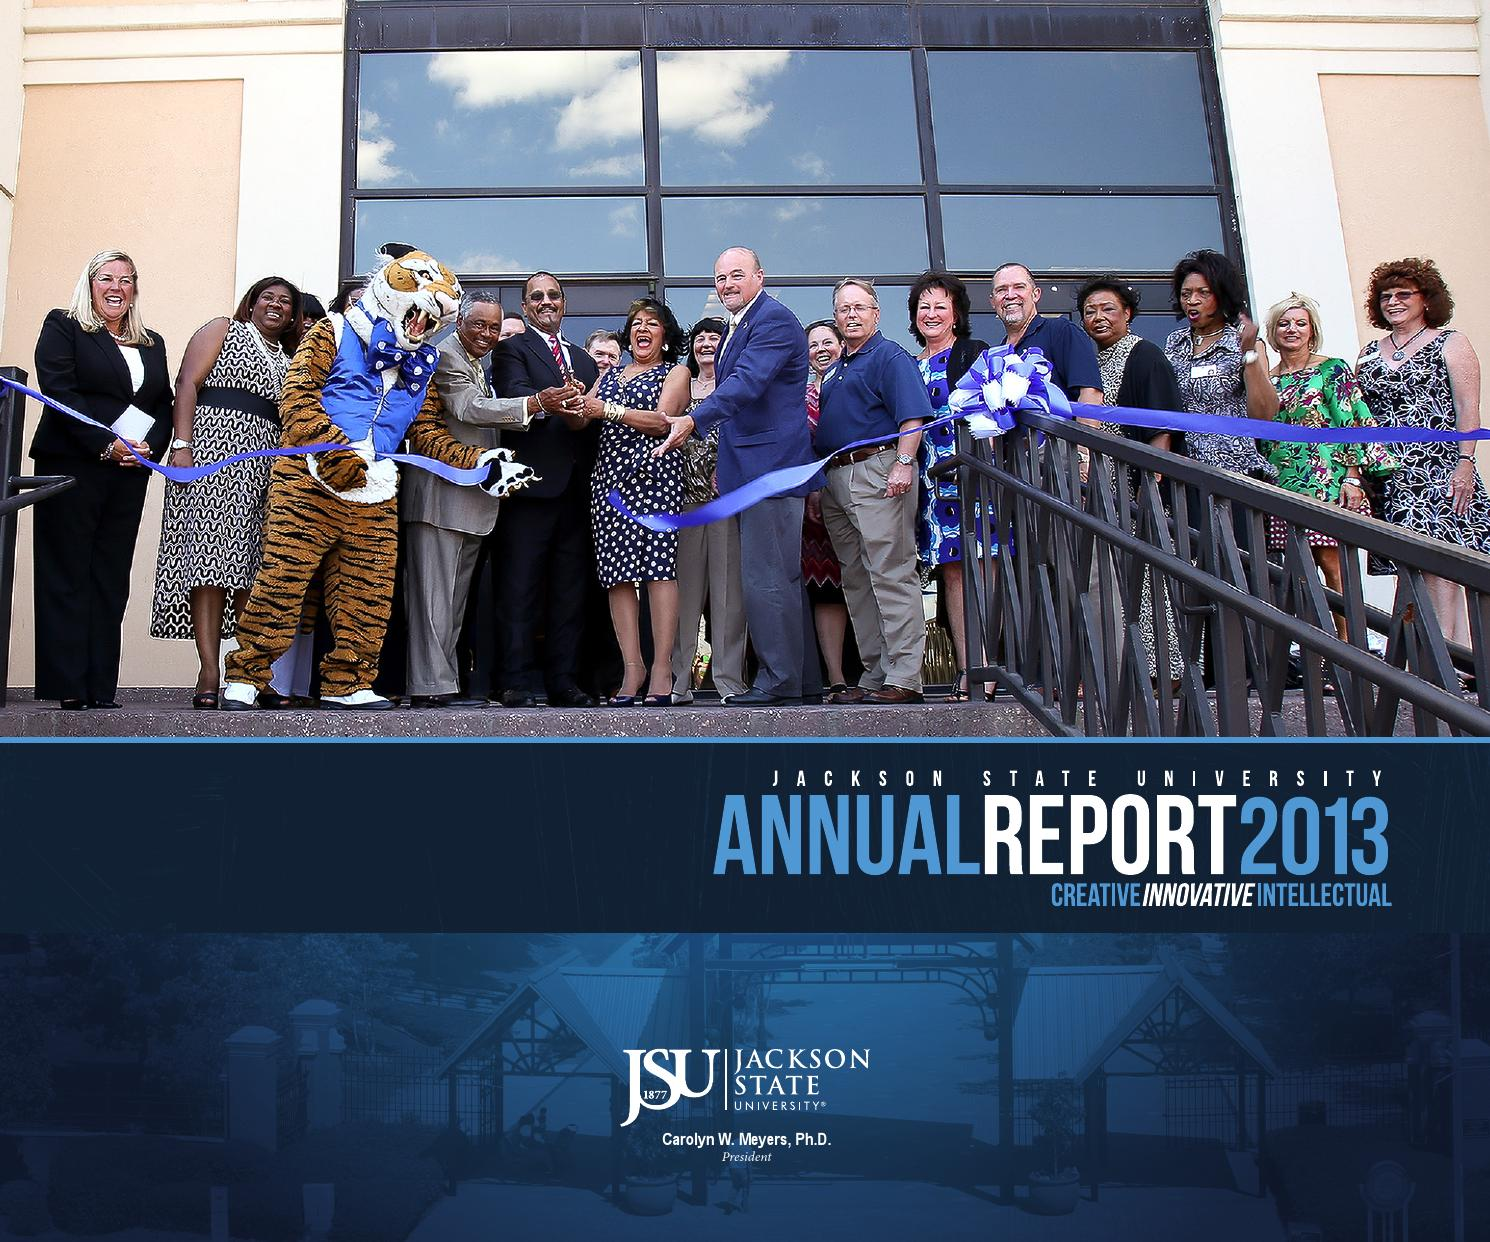 jsu 2013 annual report by jackson state university issuu